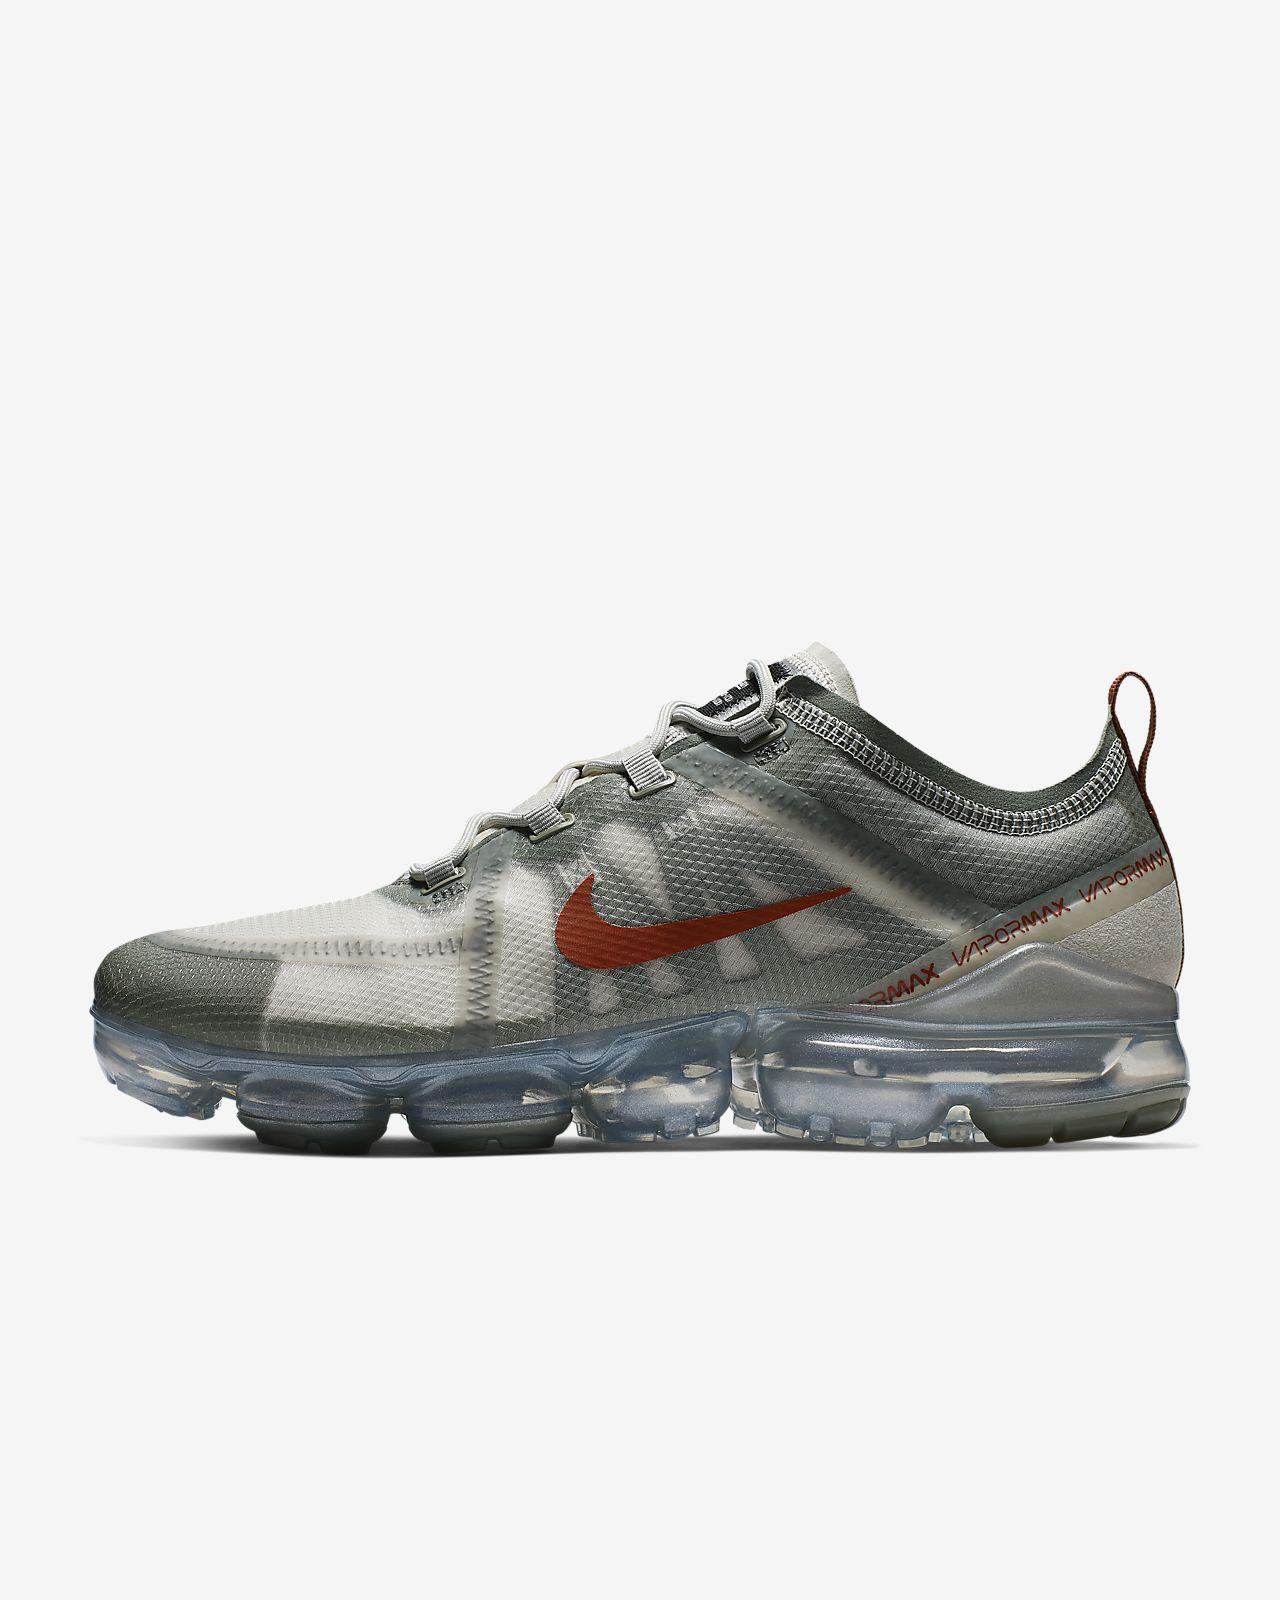 384bc28abe36 Nike Air VaporMax 2019 Shoe. Nike.com CA